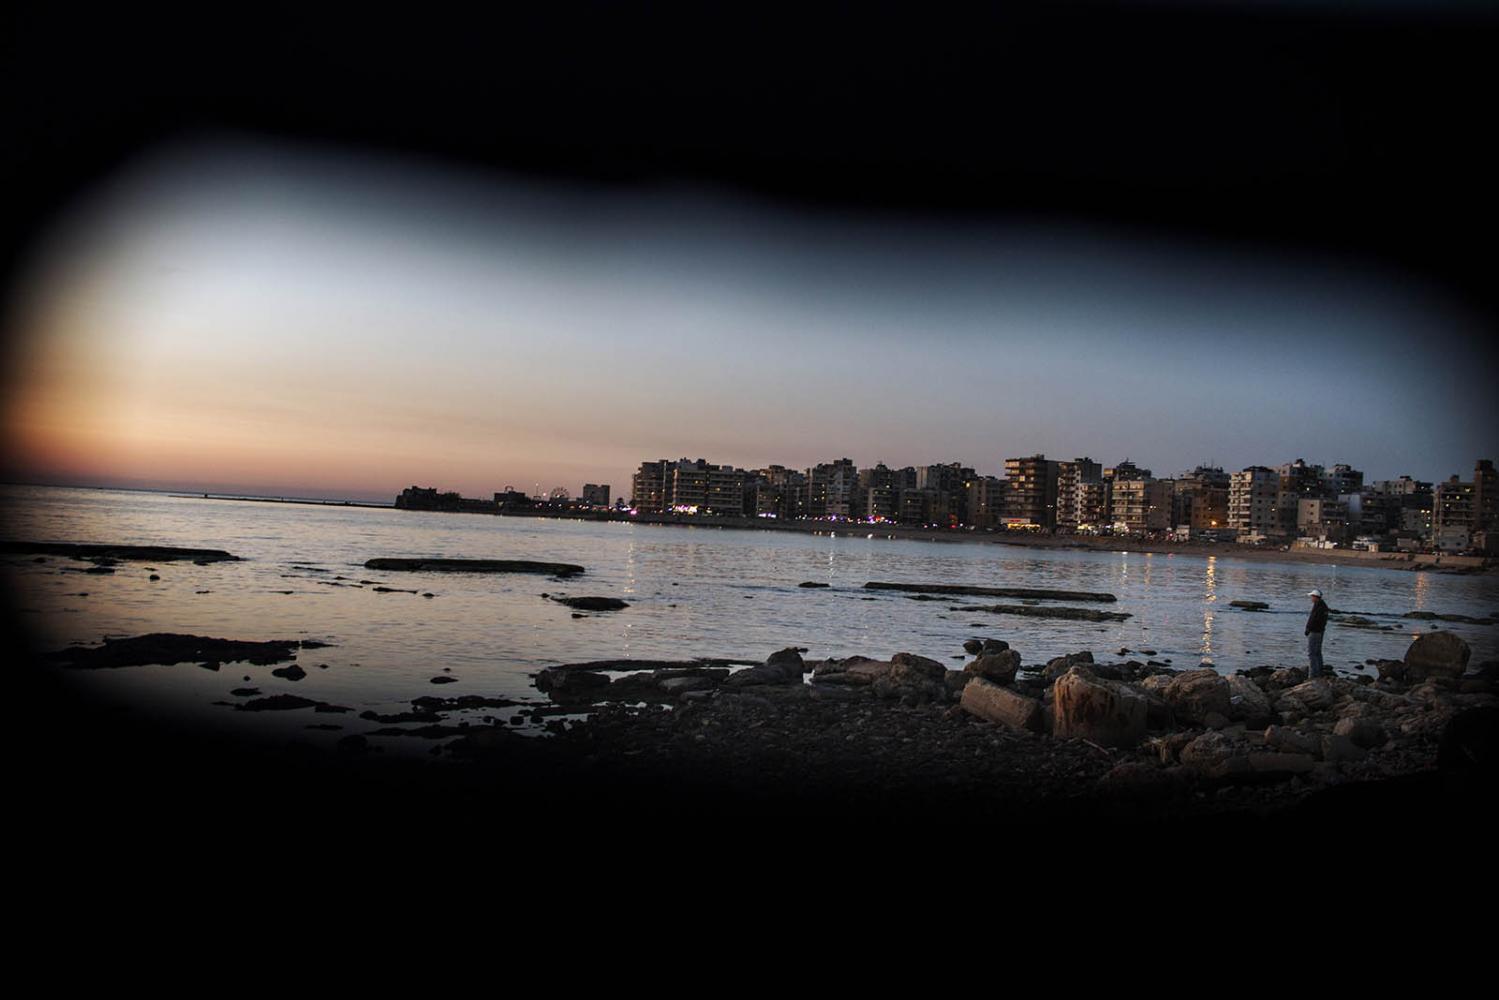 Photography image - Loading Tripoli-Nzz-016.jpg